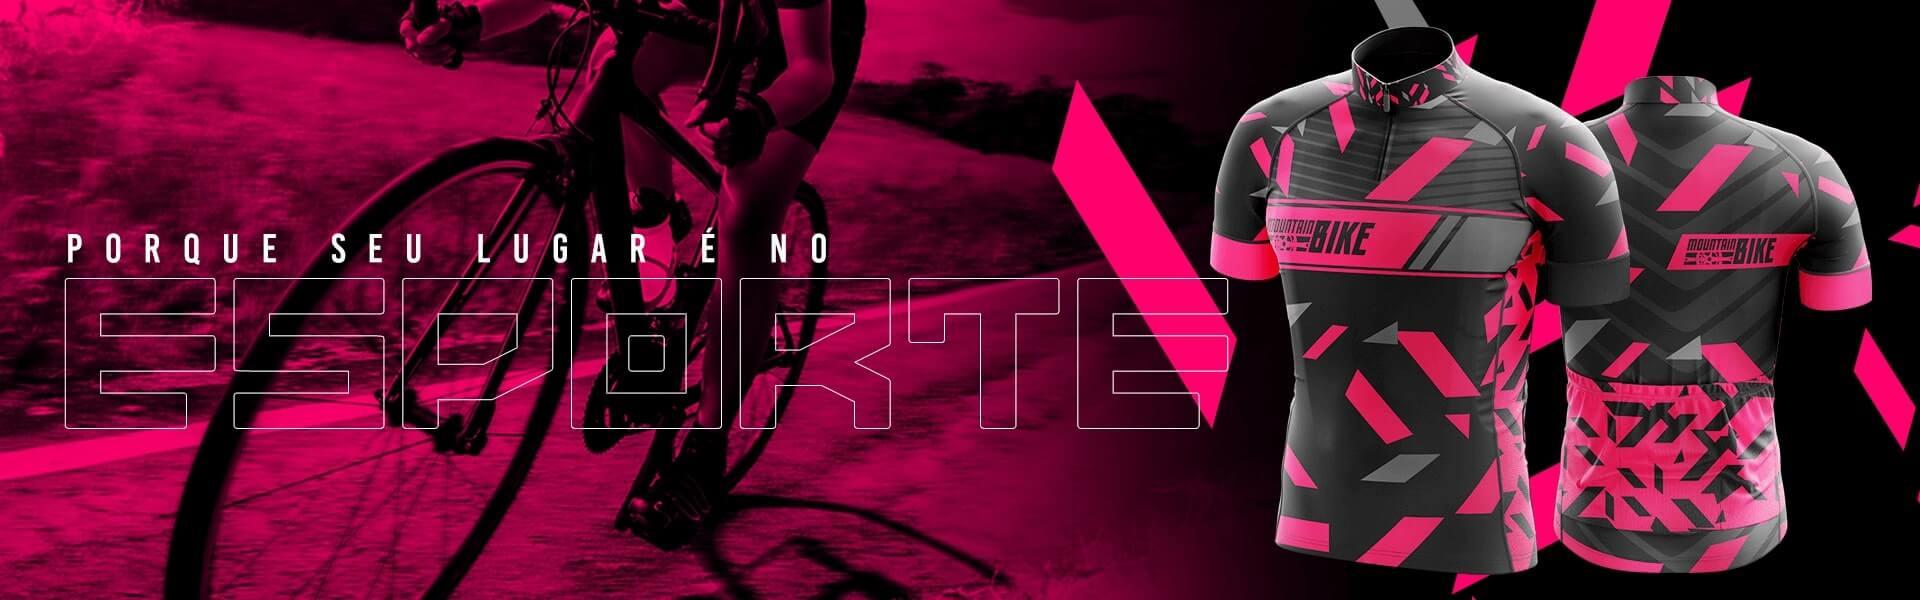 banner-ciclismo-desktop-2